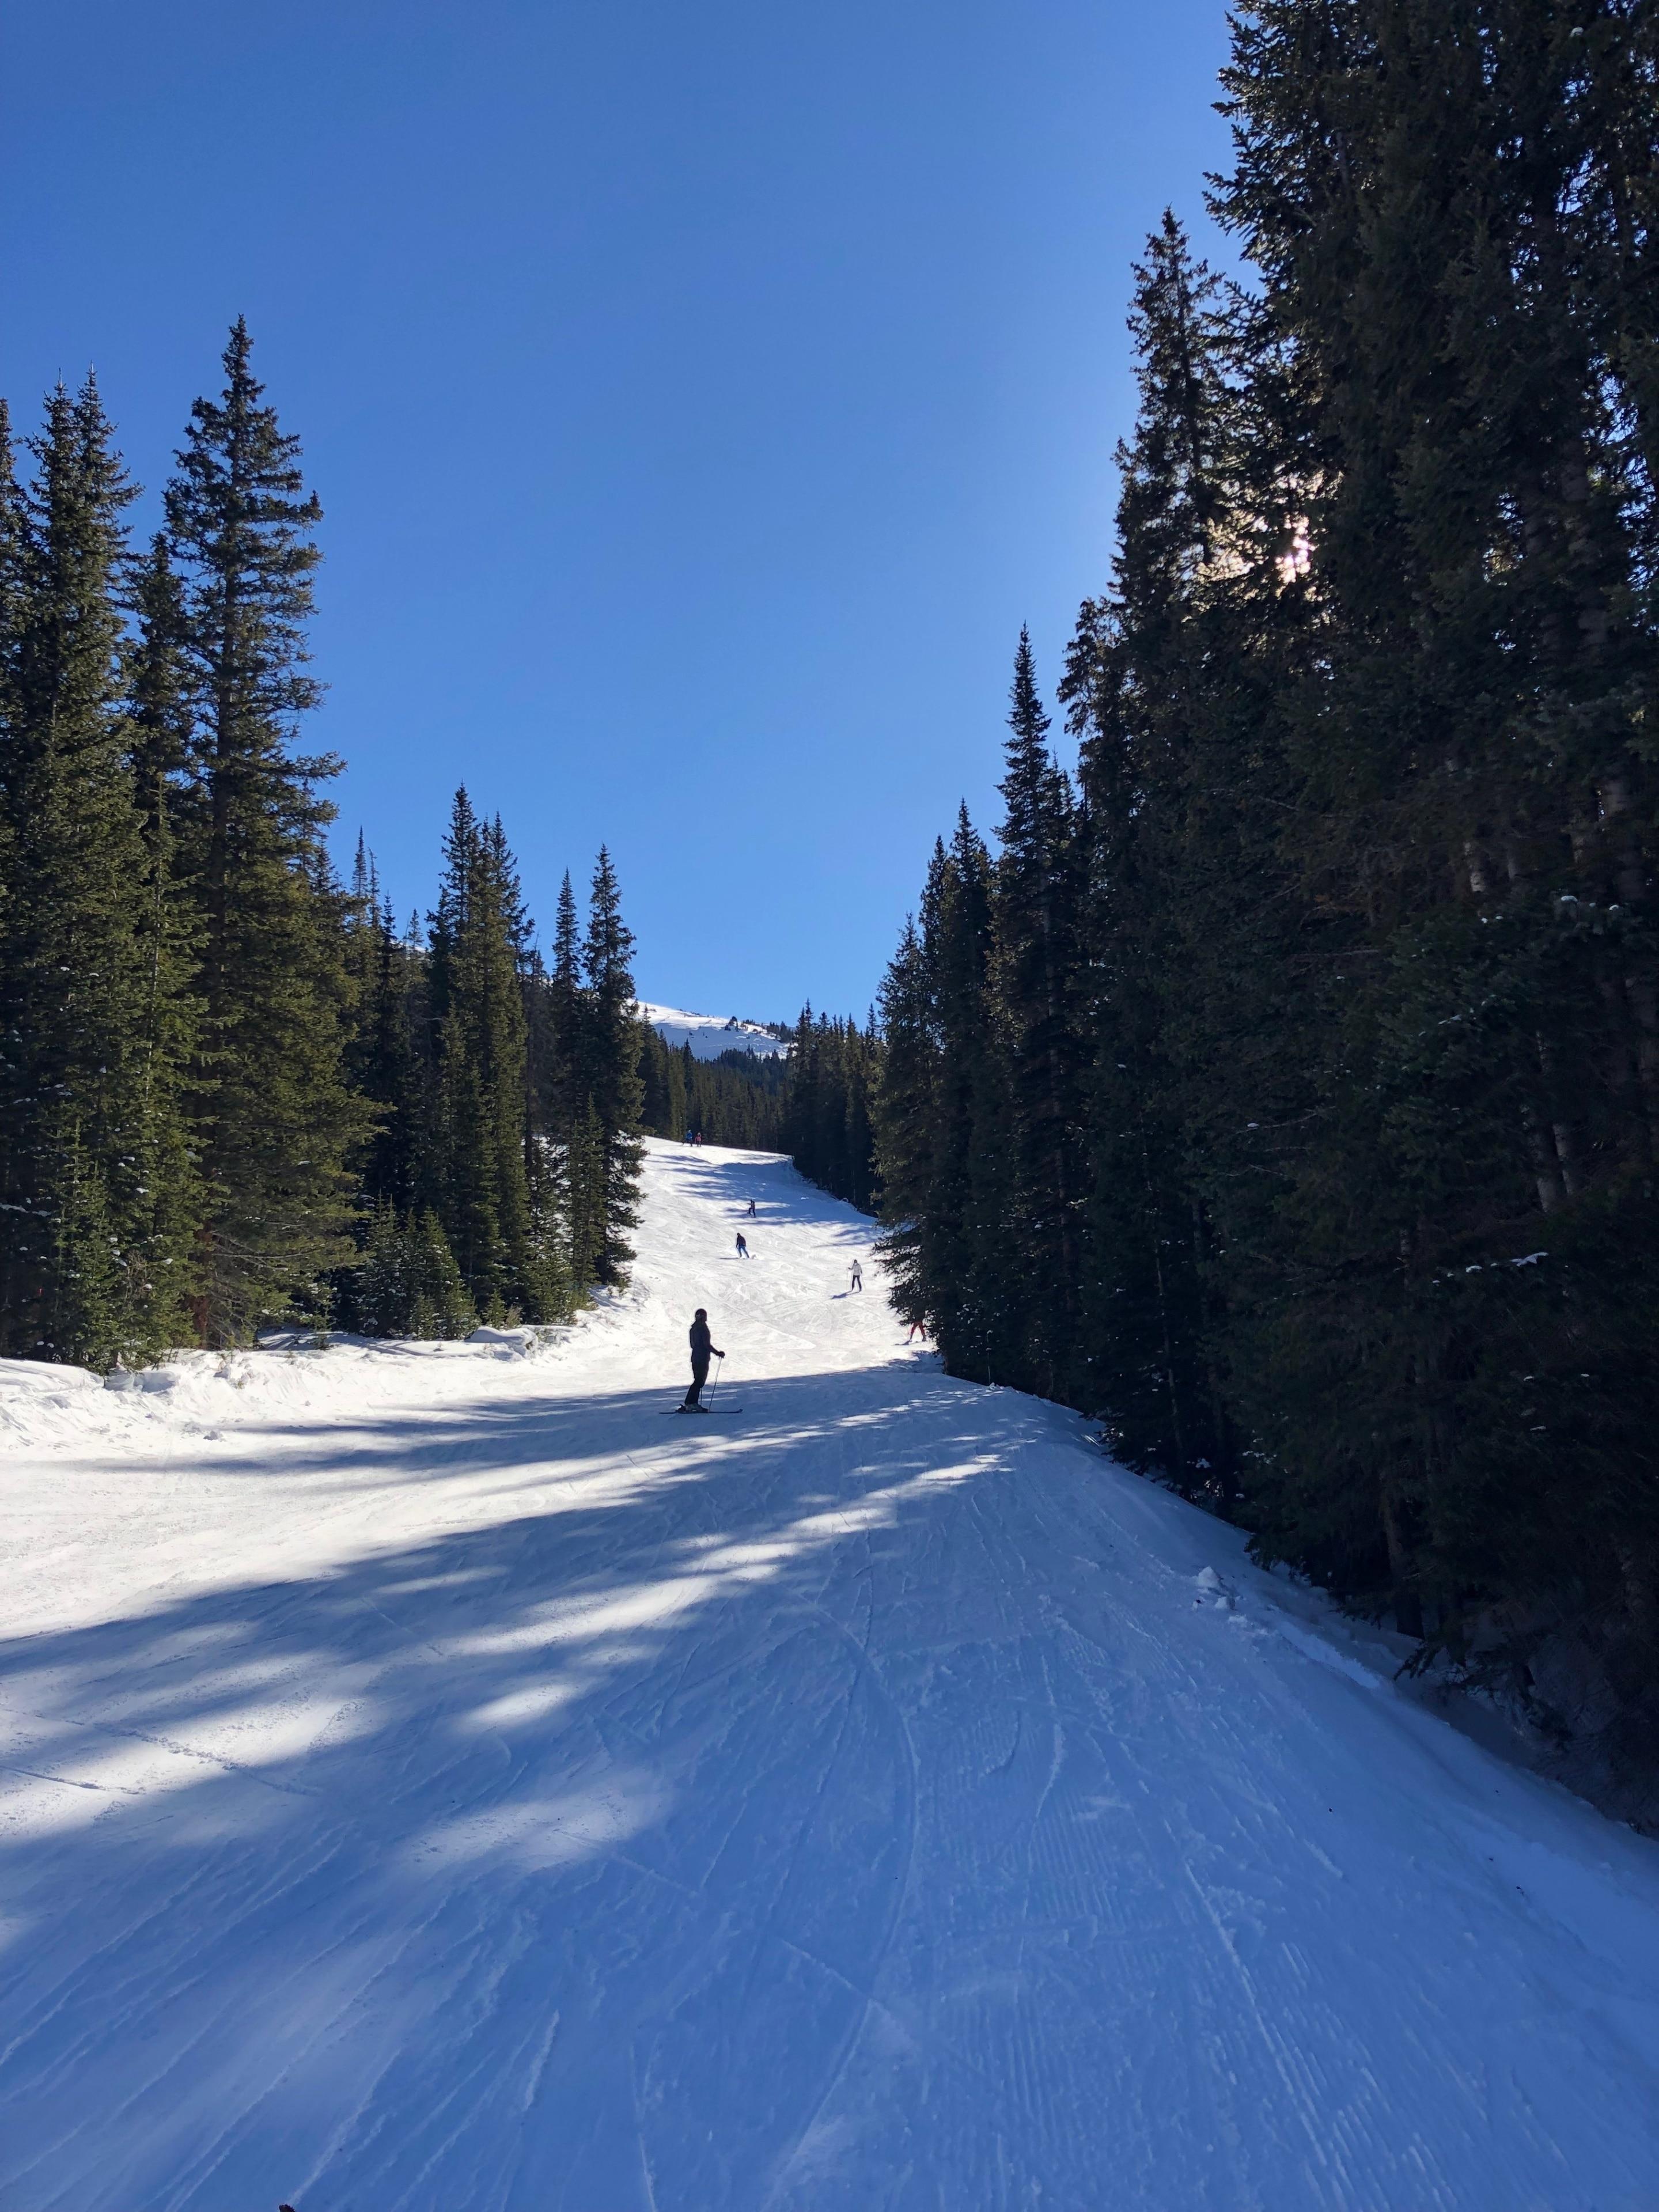 Loveland (skigebied), Dillon, Colorado, Verenigde Staten